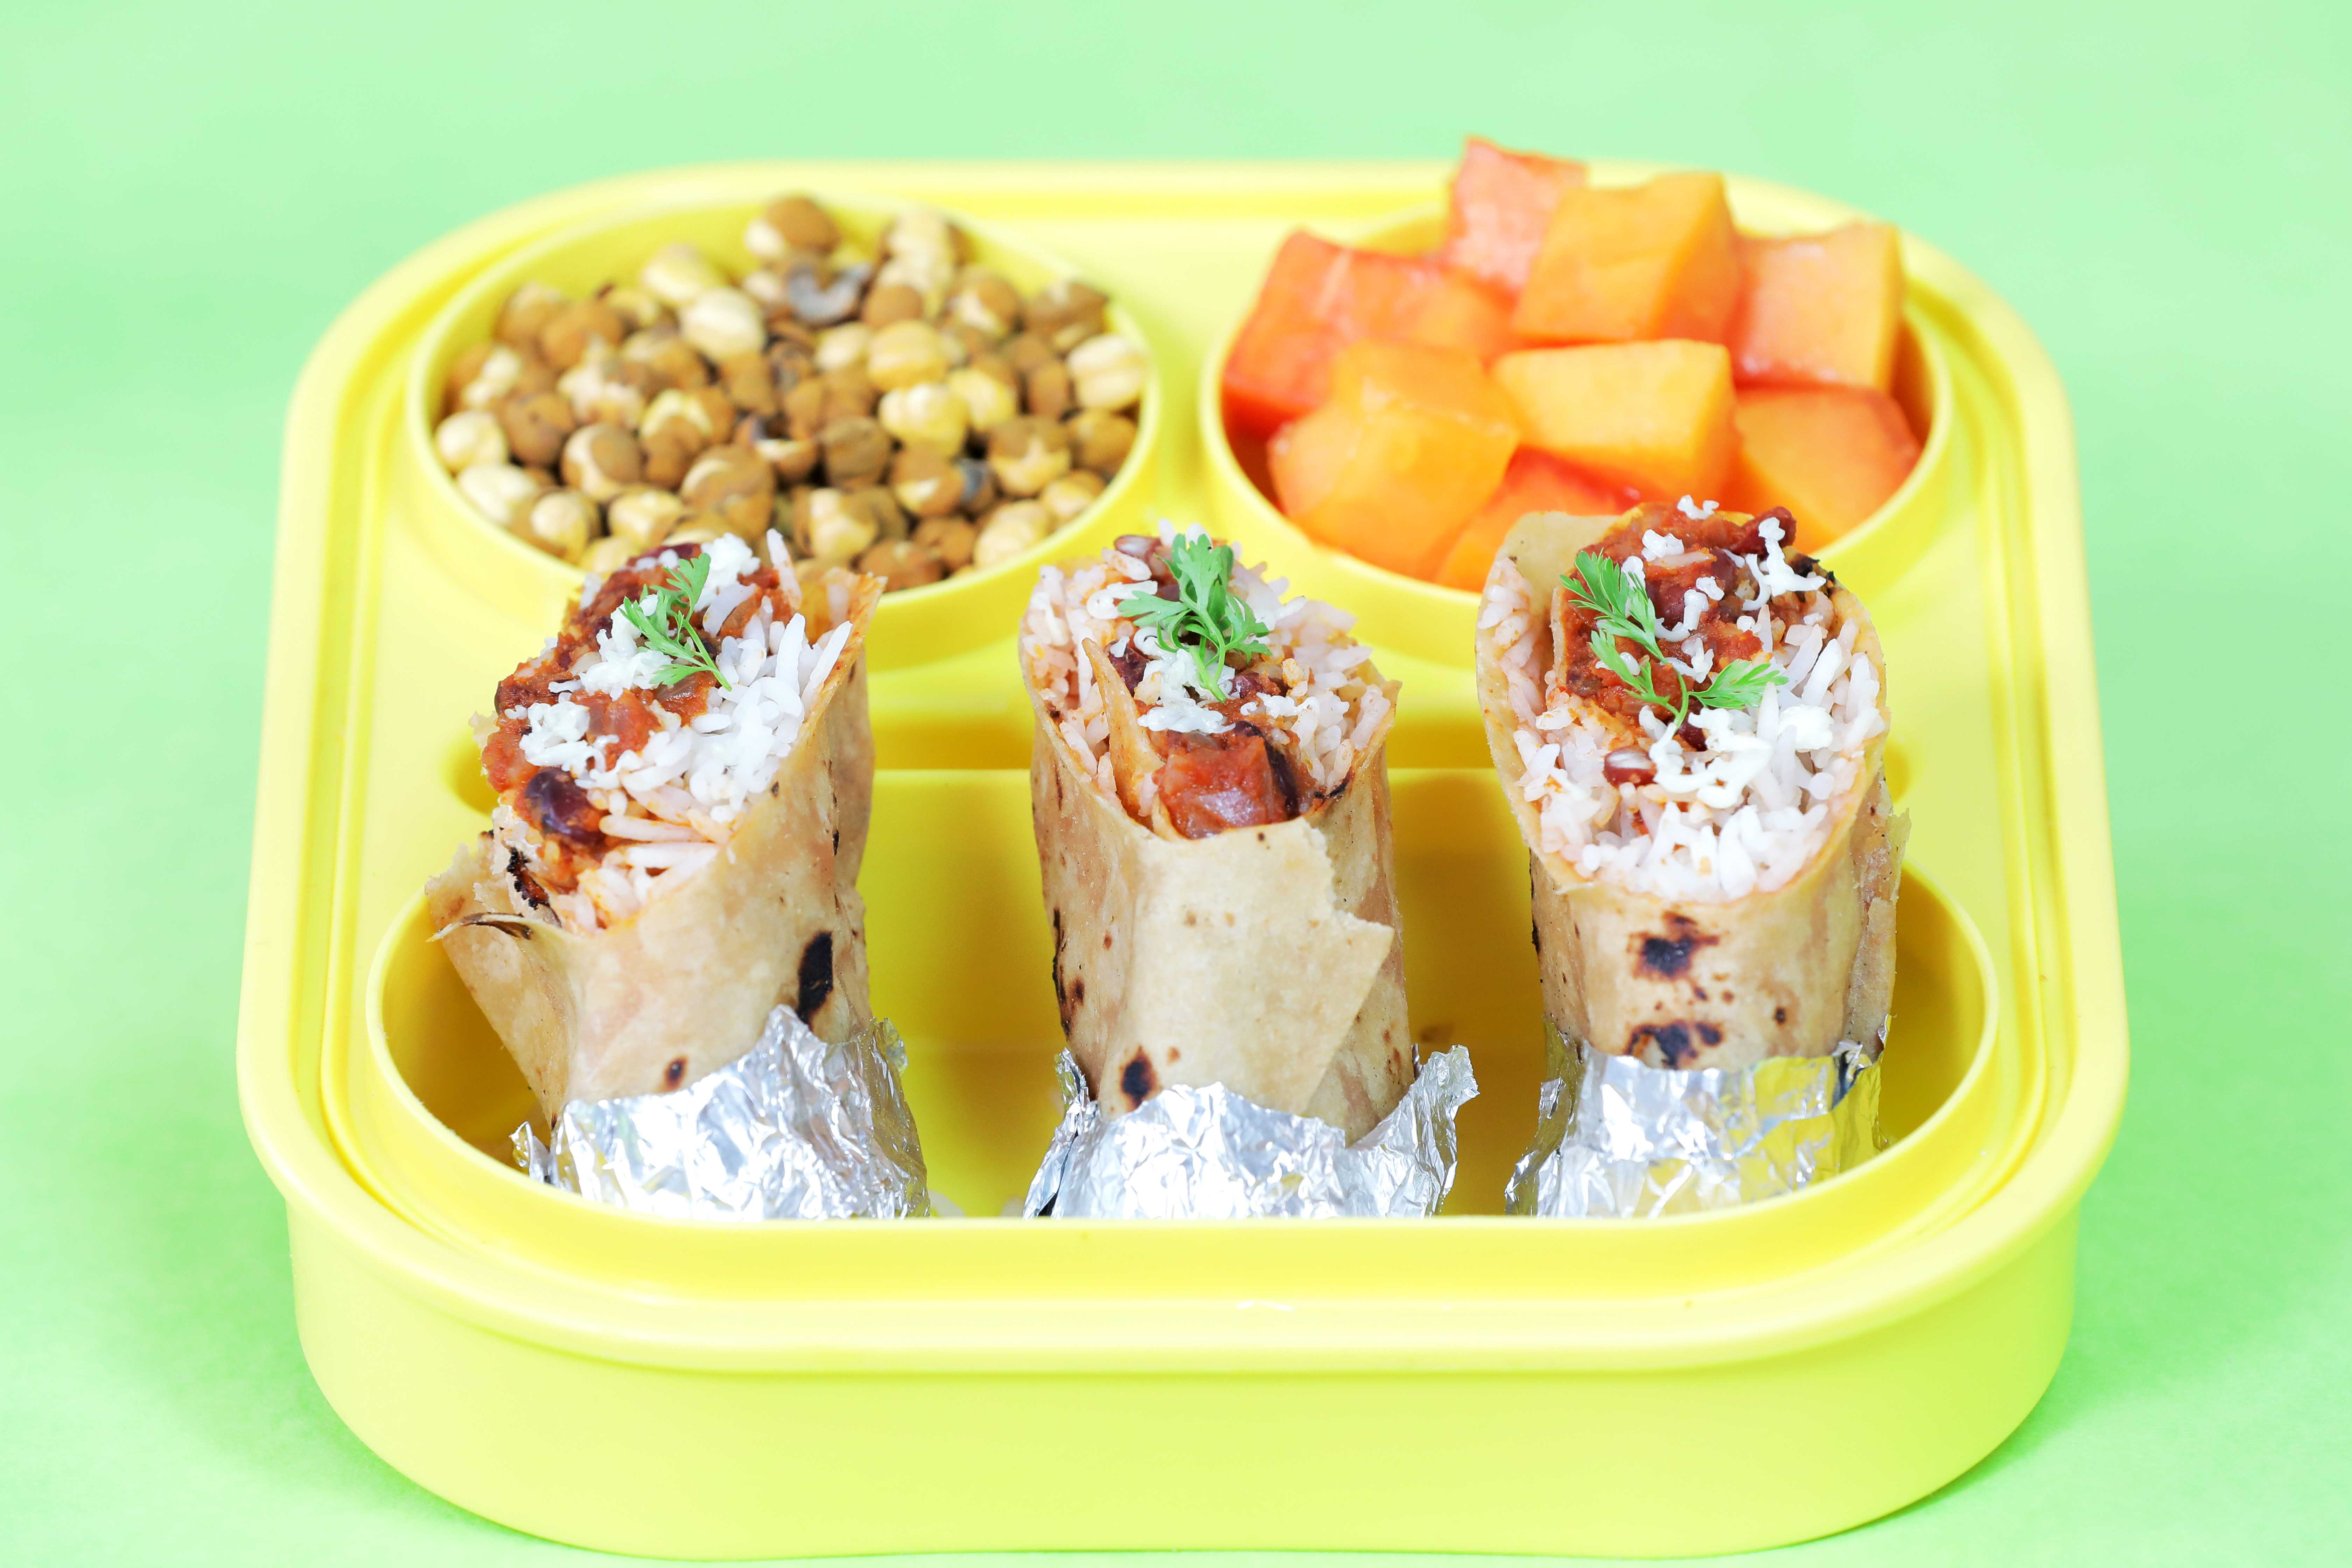 Mexican Burrito Recipe: Indian-Style Burritos